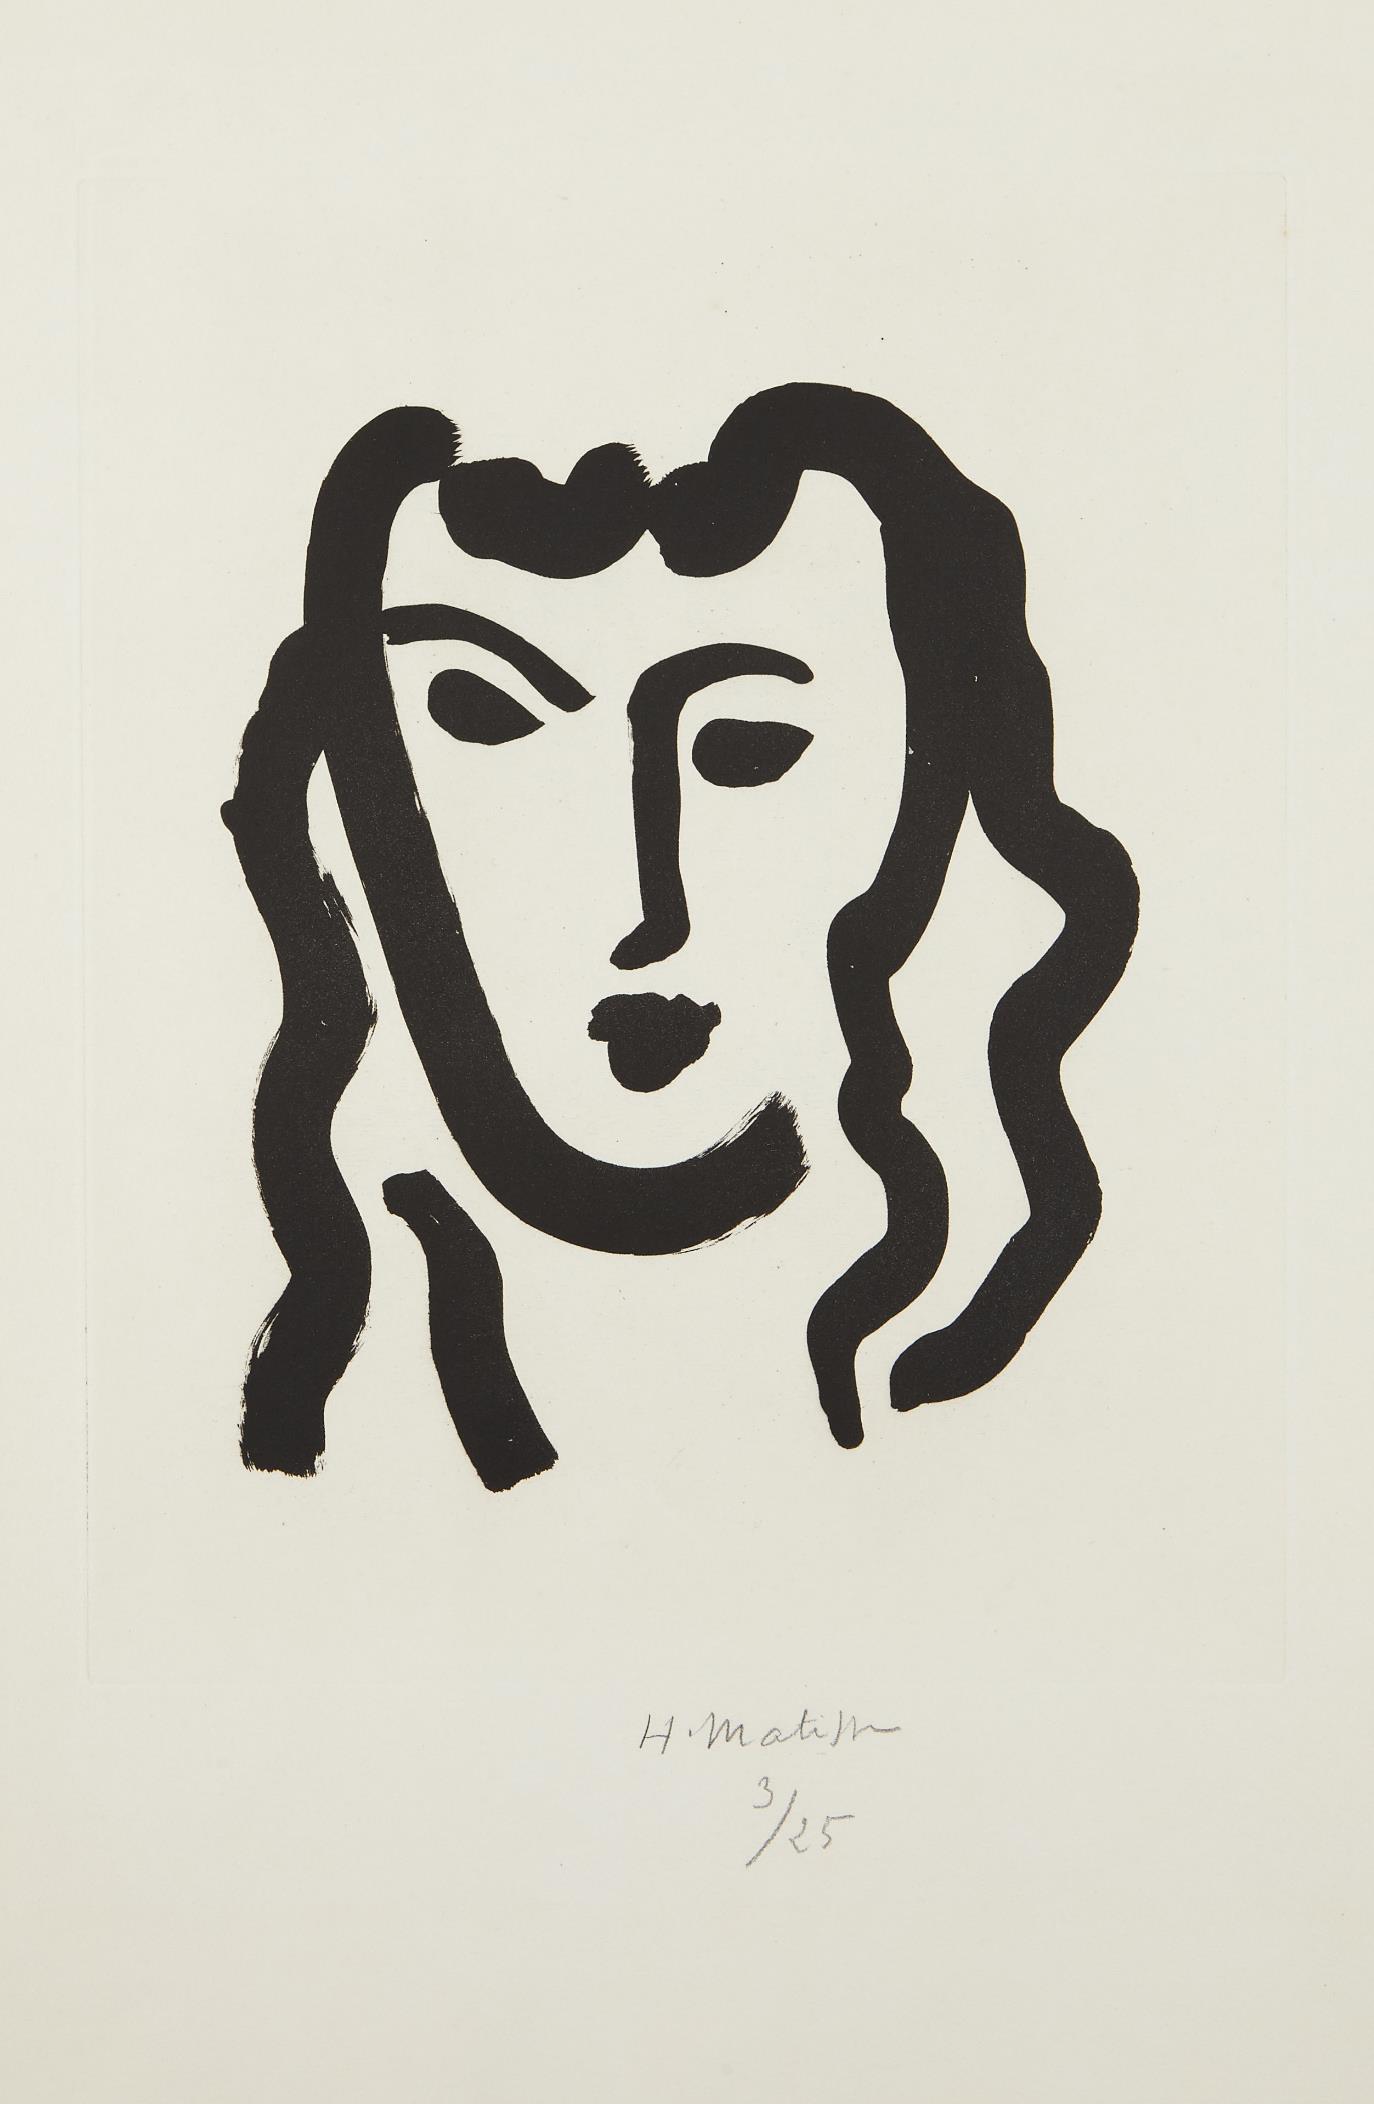 Henri Matisse-Patitcha. Masque-1947